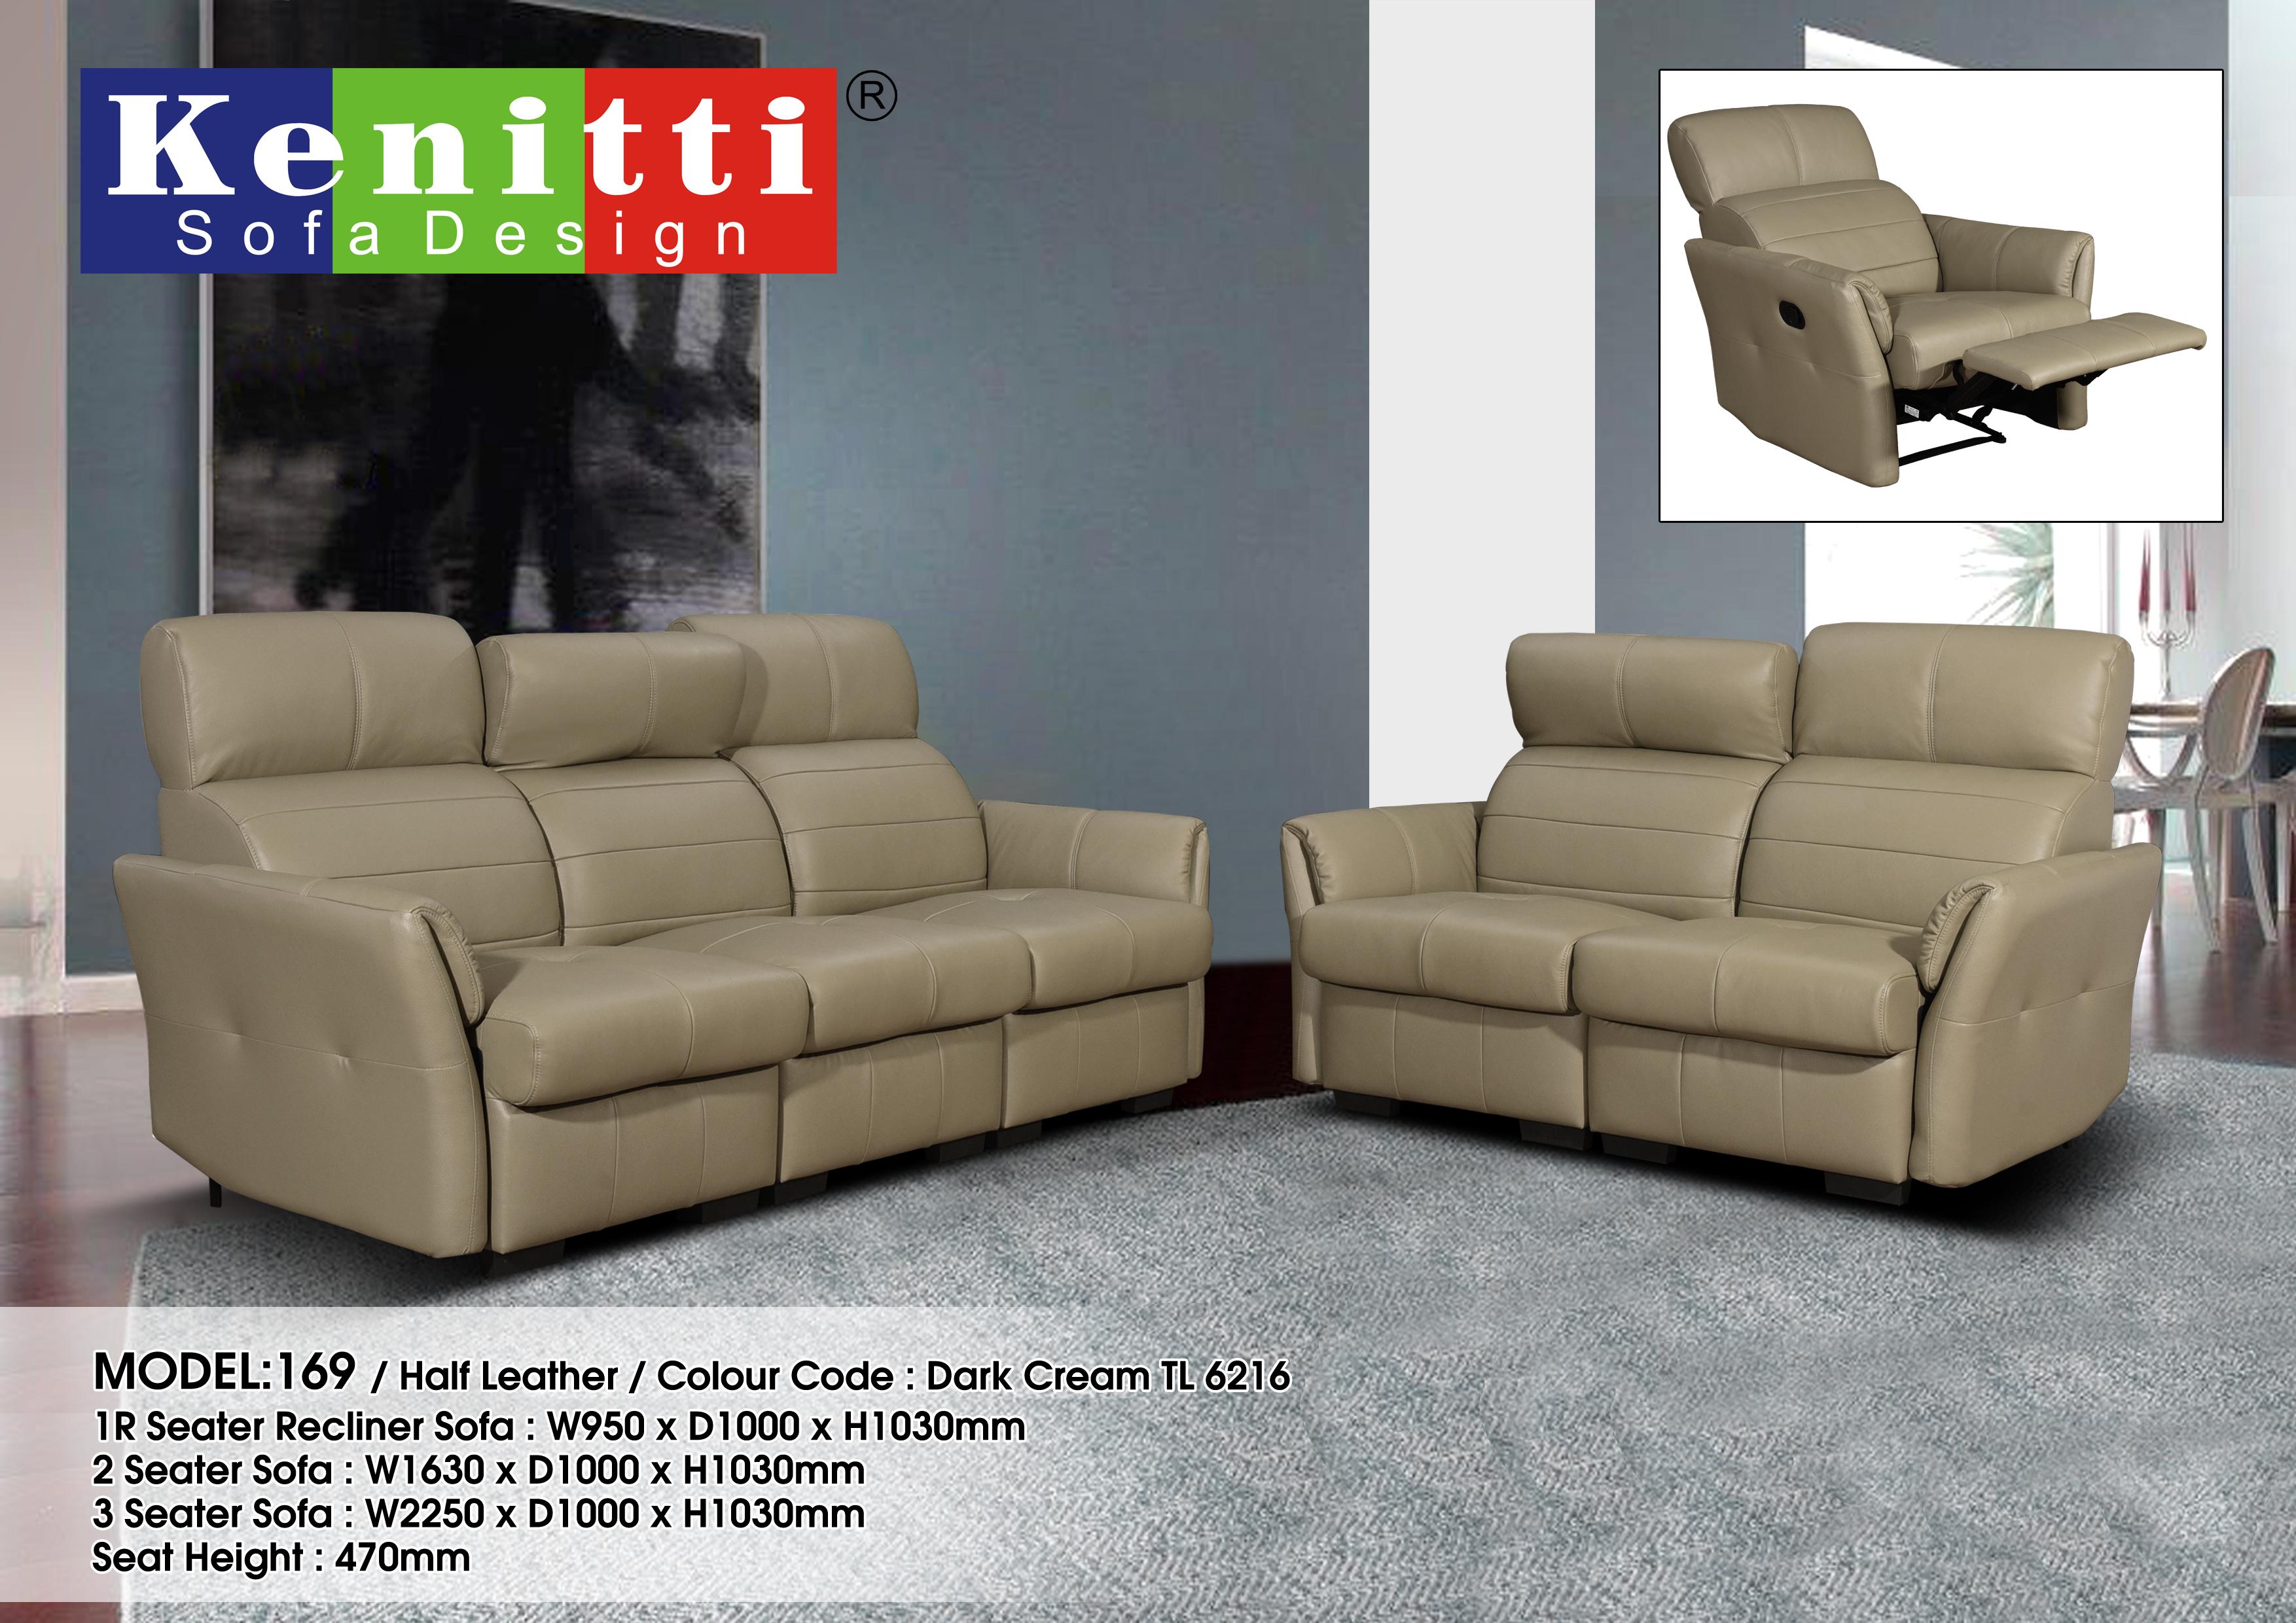 Model - 169 - Half Leather